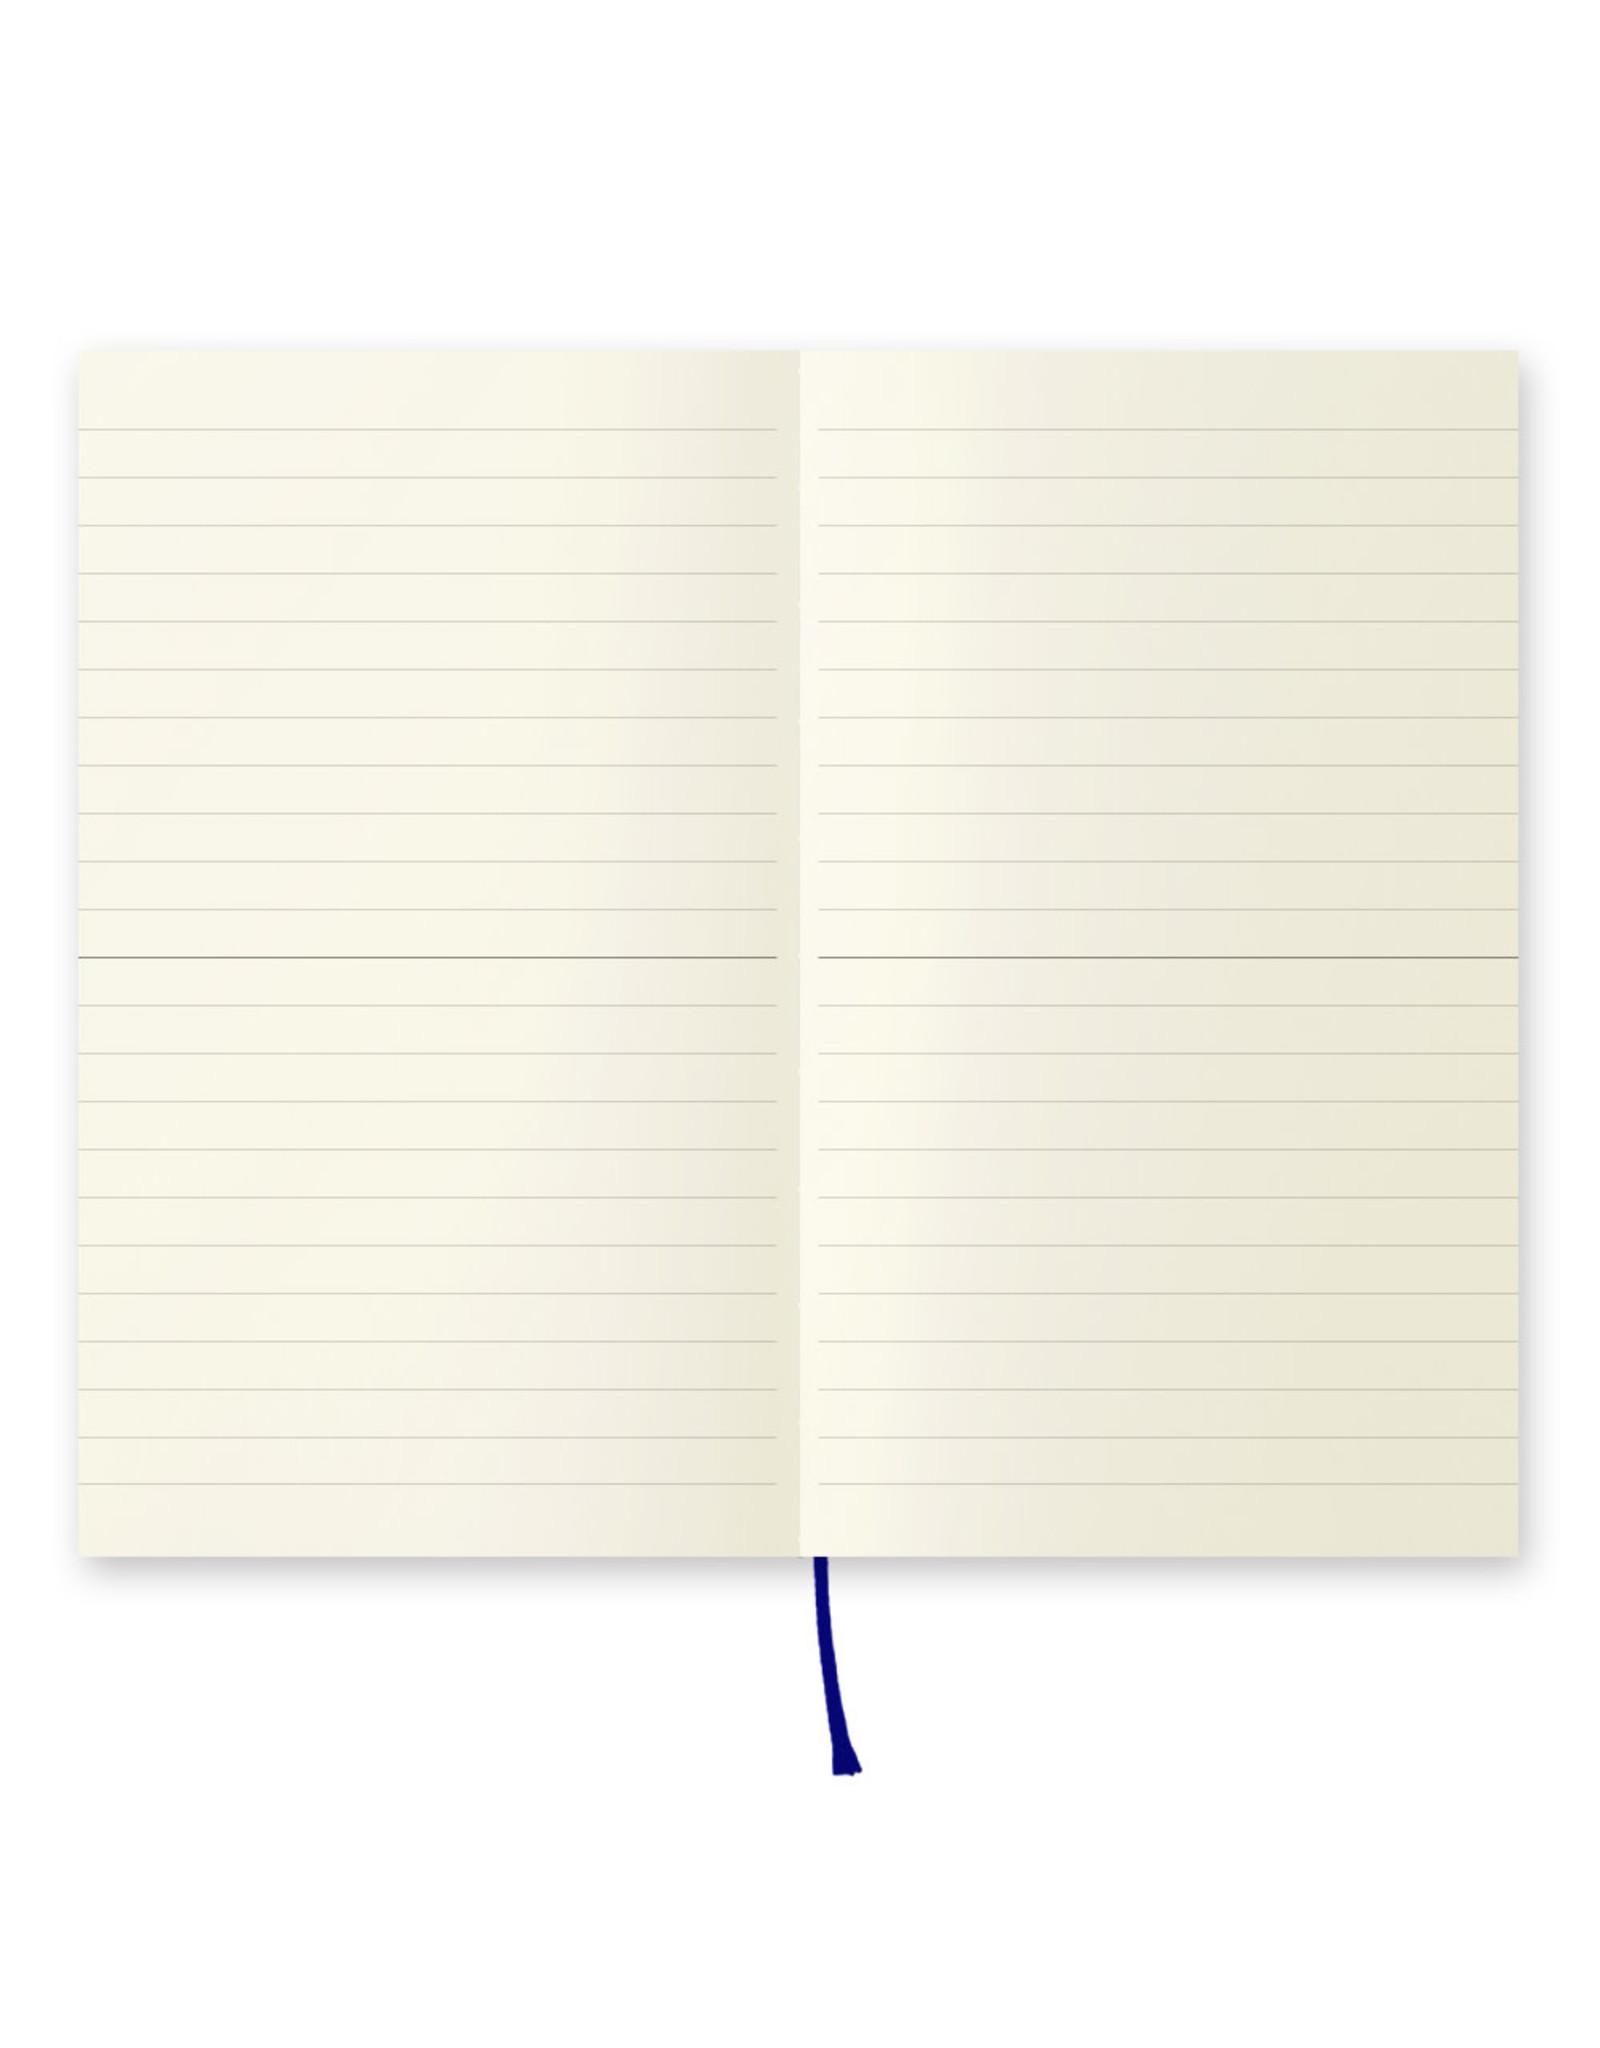 Designphil Inc. MD NOTEBOOK  LINED ENGLISH CAPTION B6 SLIM H175×W105×D10mm